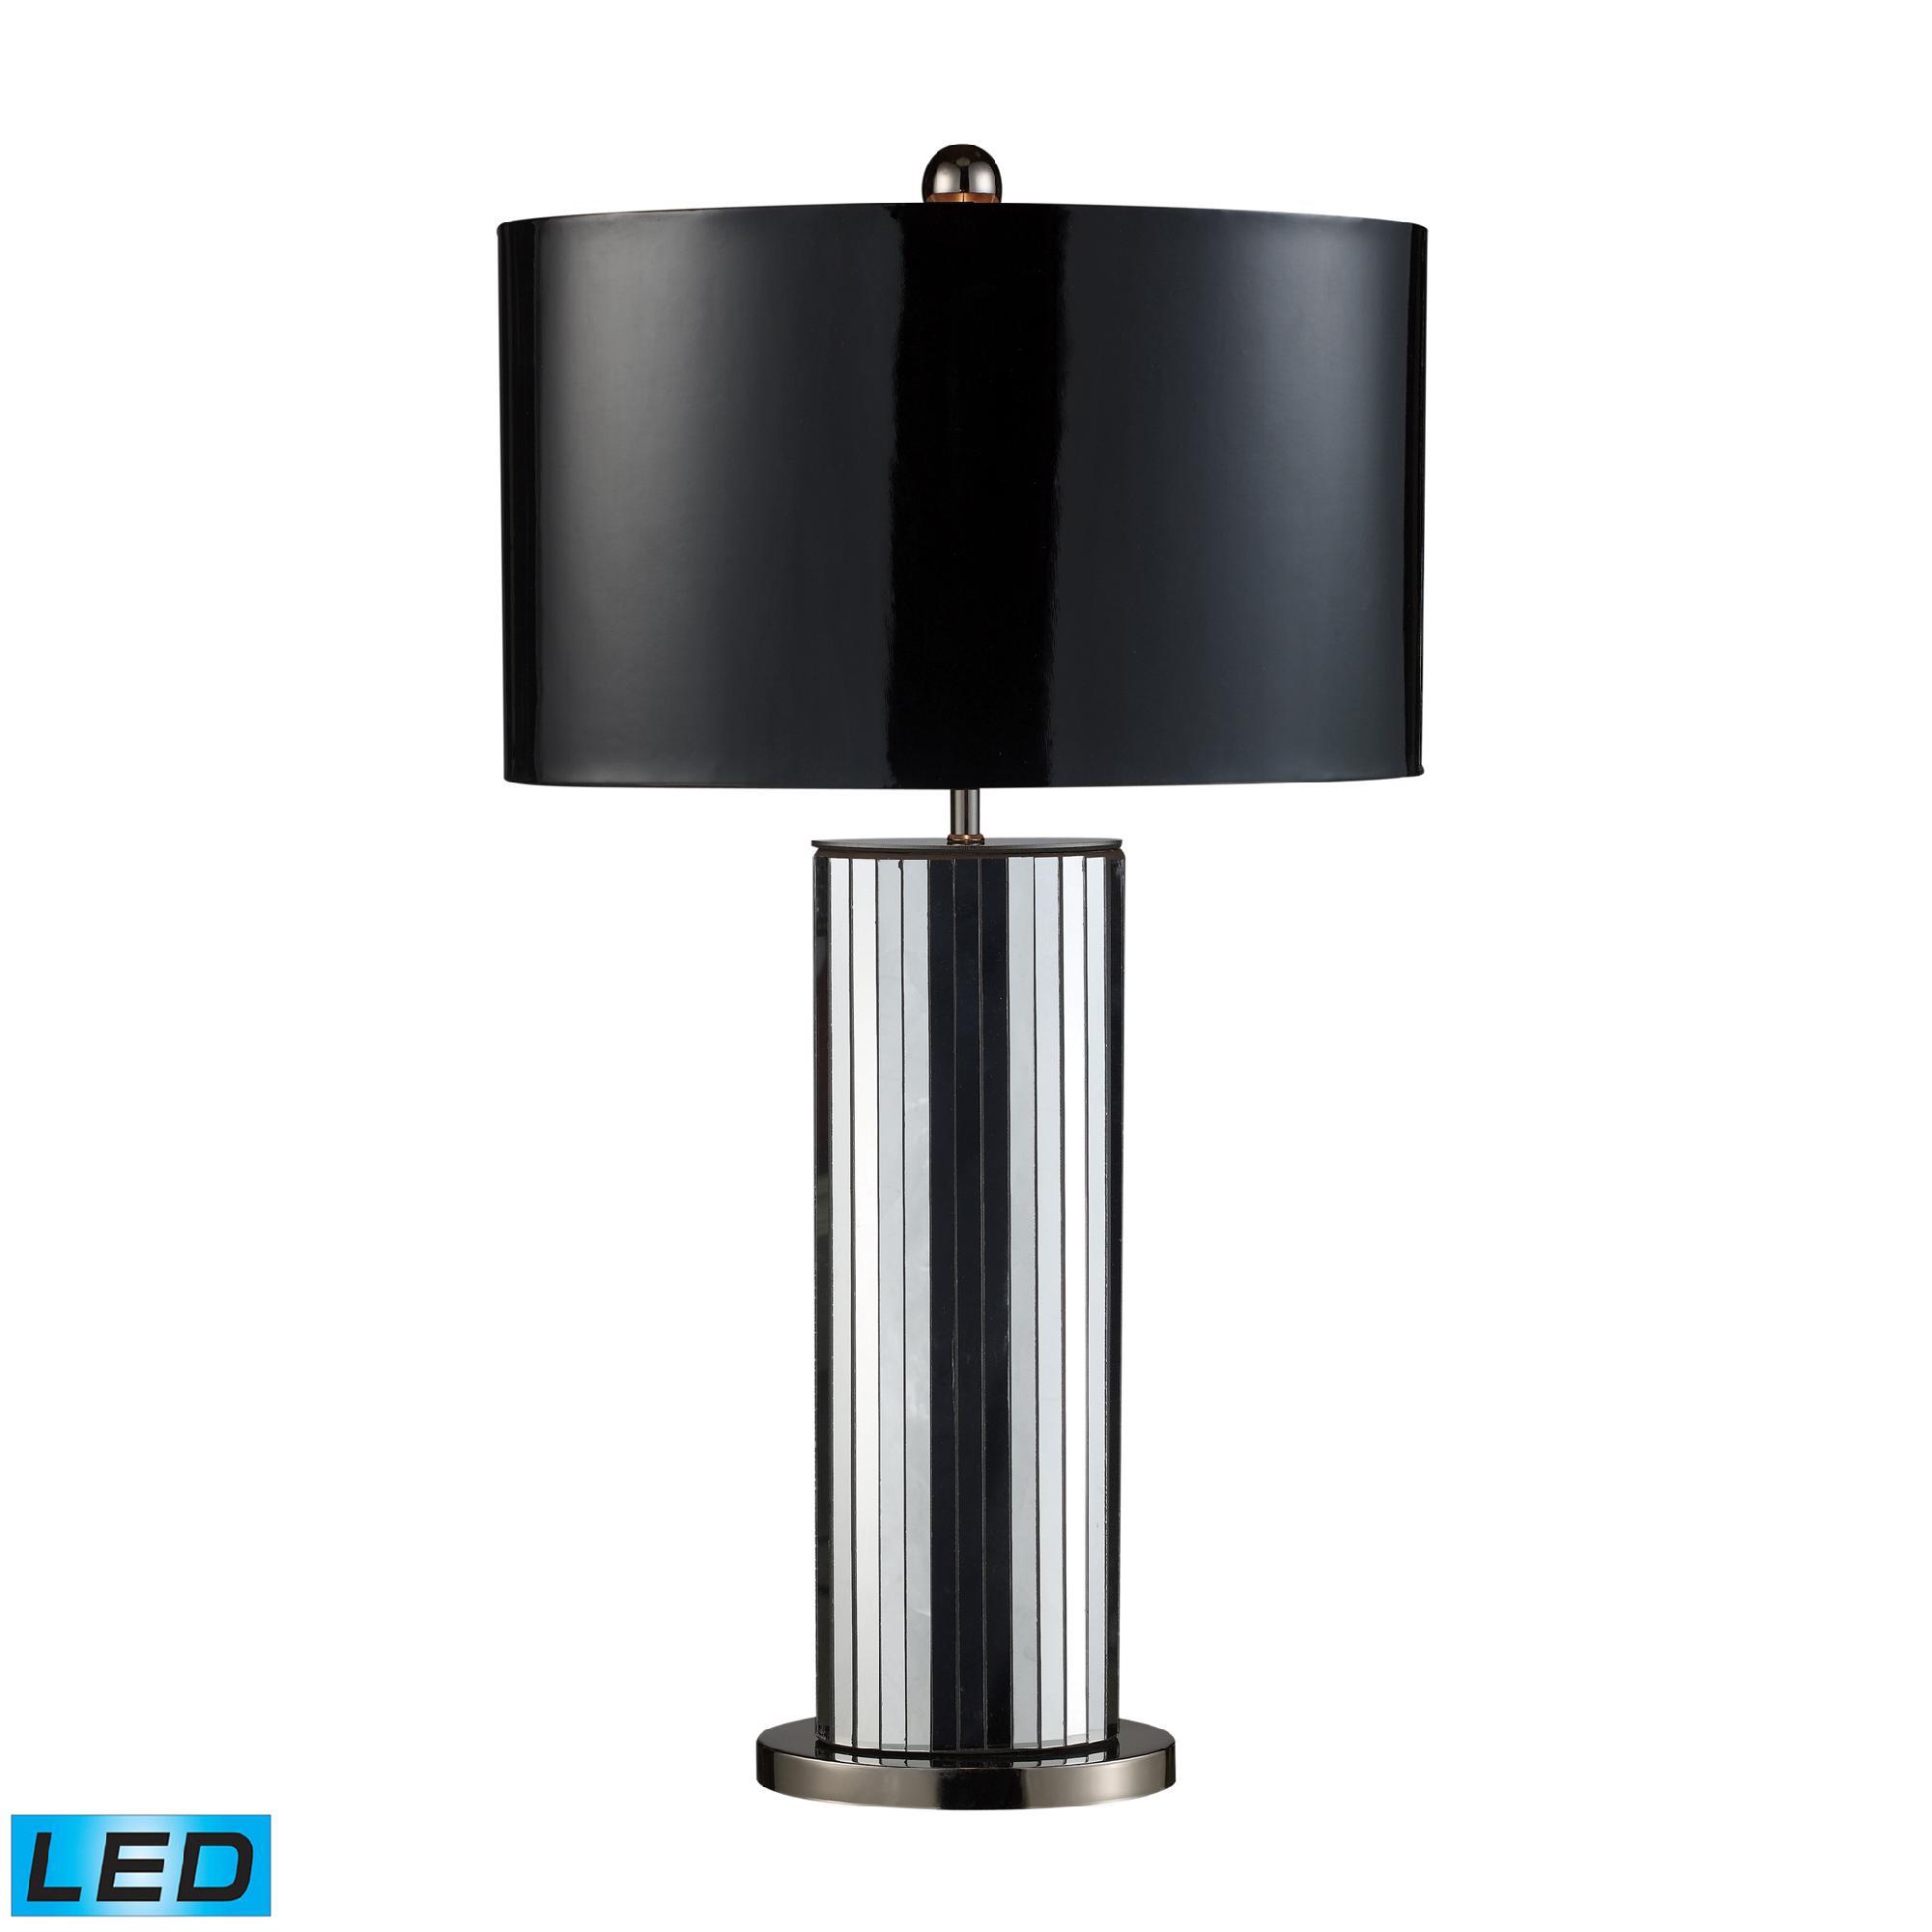 Dimond Shreve Table Lamp- LED